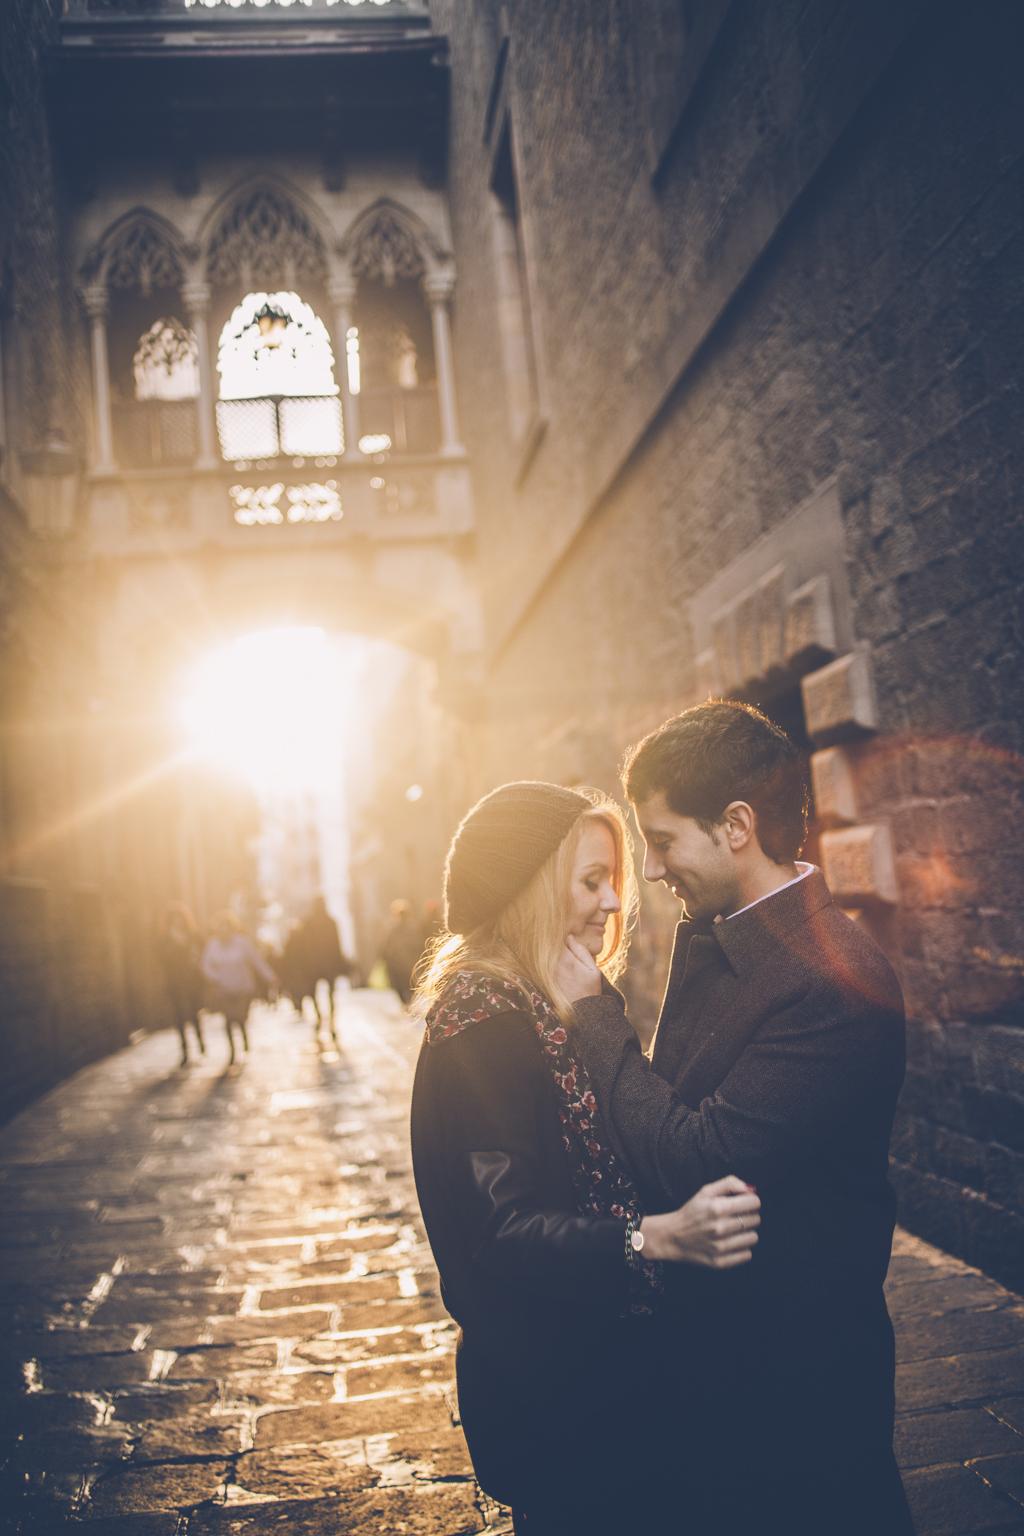 fotógrafo de preboda barcelona :: fotógrafo de parejas barcelona :: fotógrafo de bodas barcelona :: fotógrafía romántica :: fotógrafo natural